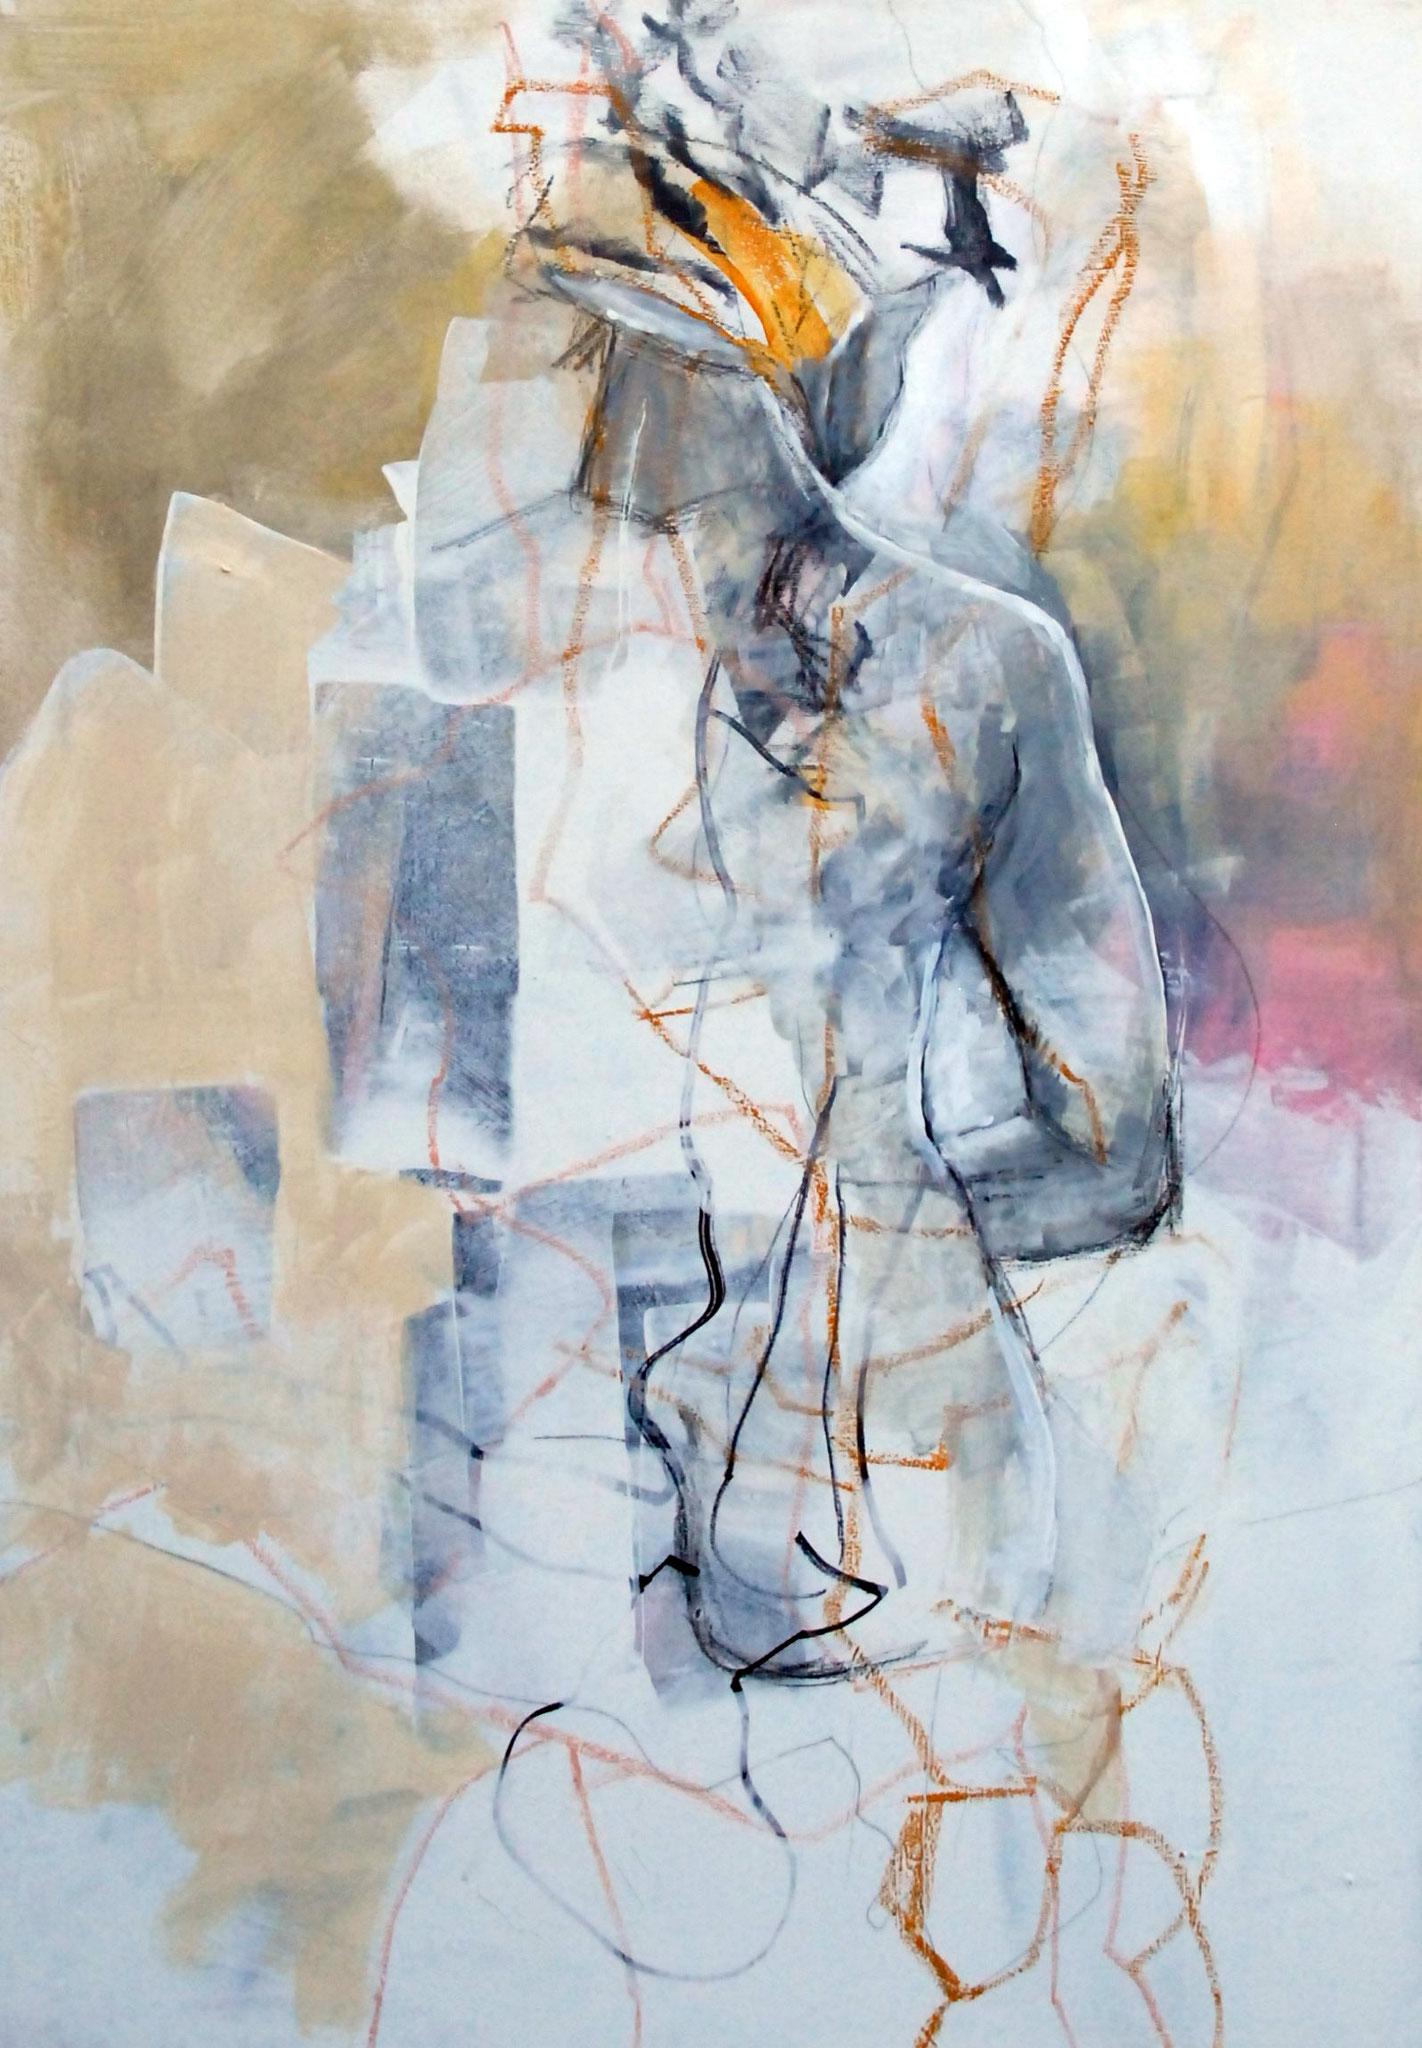 Back, Acryl und Stifte auf Leinwand, 100cm x 70cm